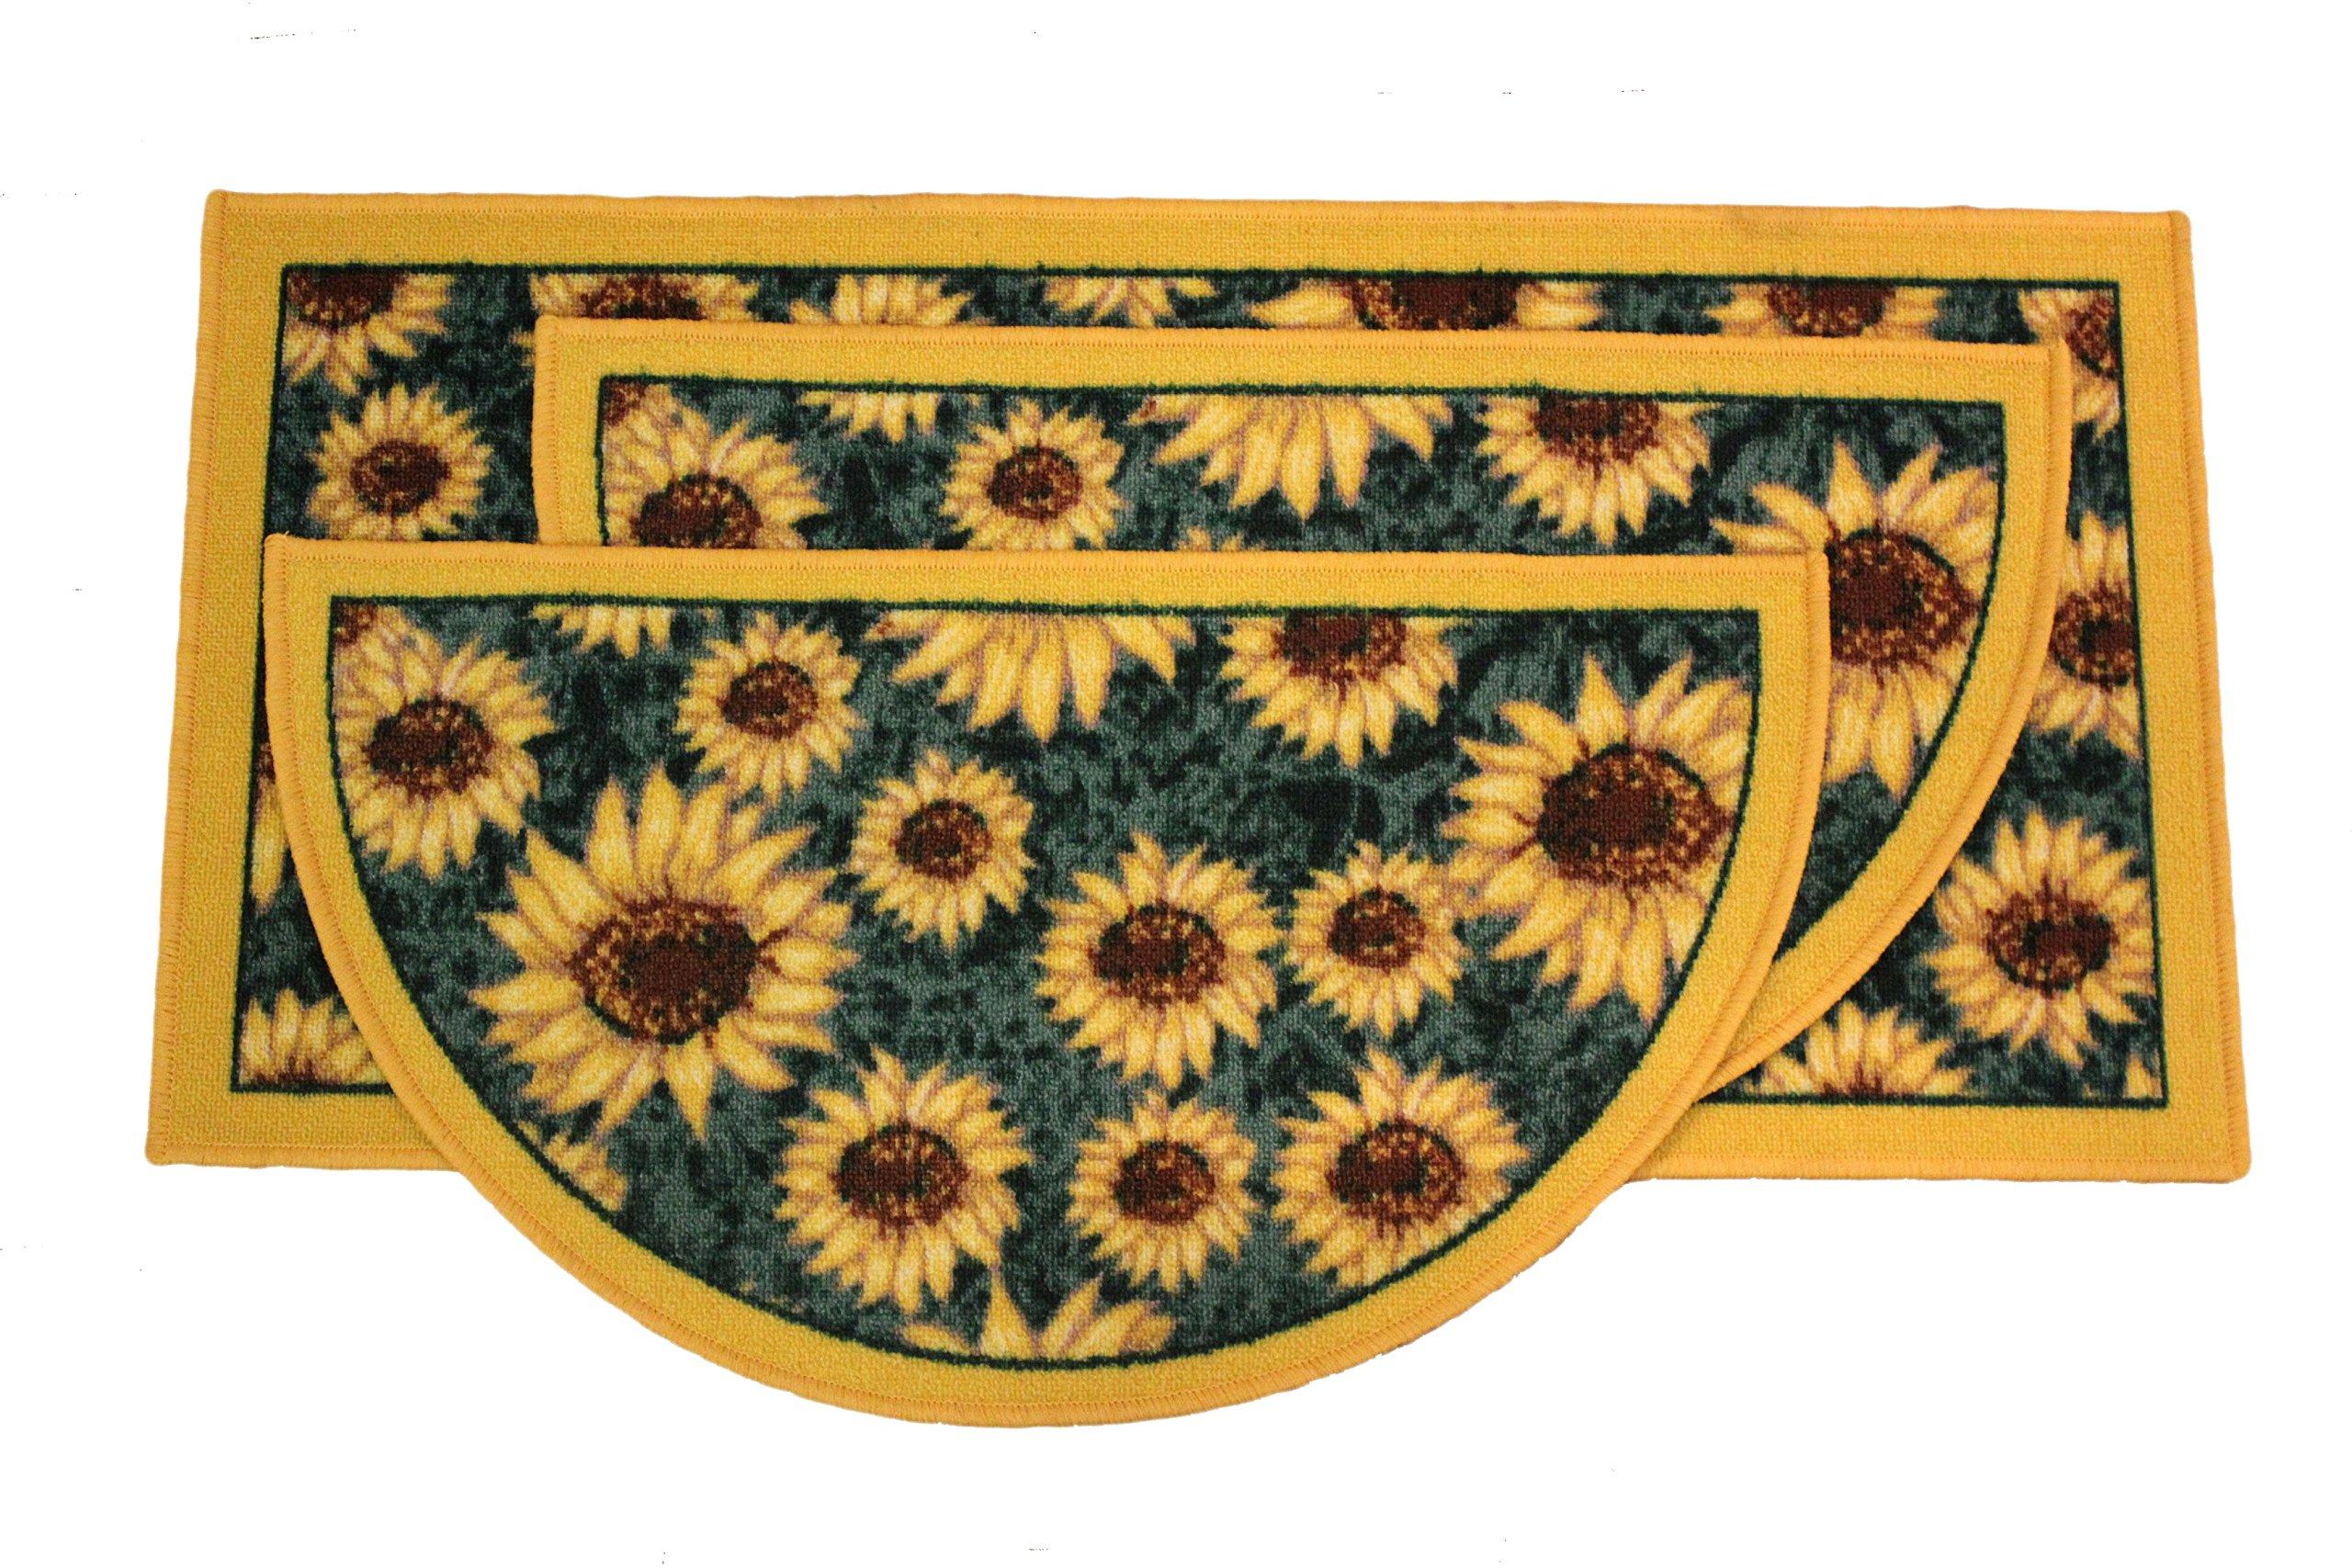 Kashi Home Sunflower 3pc Kitchen Rug Set, (2) Slice 18''x30'' Rugs, (1) 20''x40'' Mat, Non-Slid Latex Back